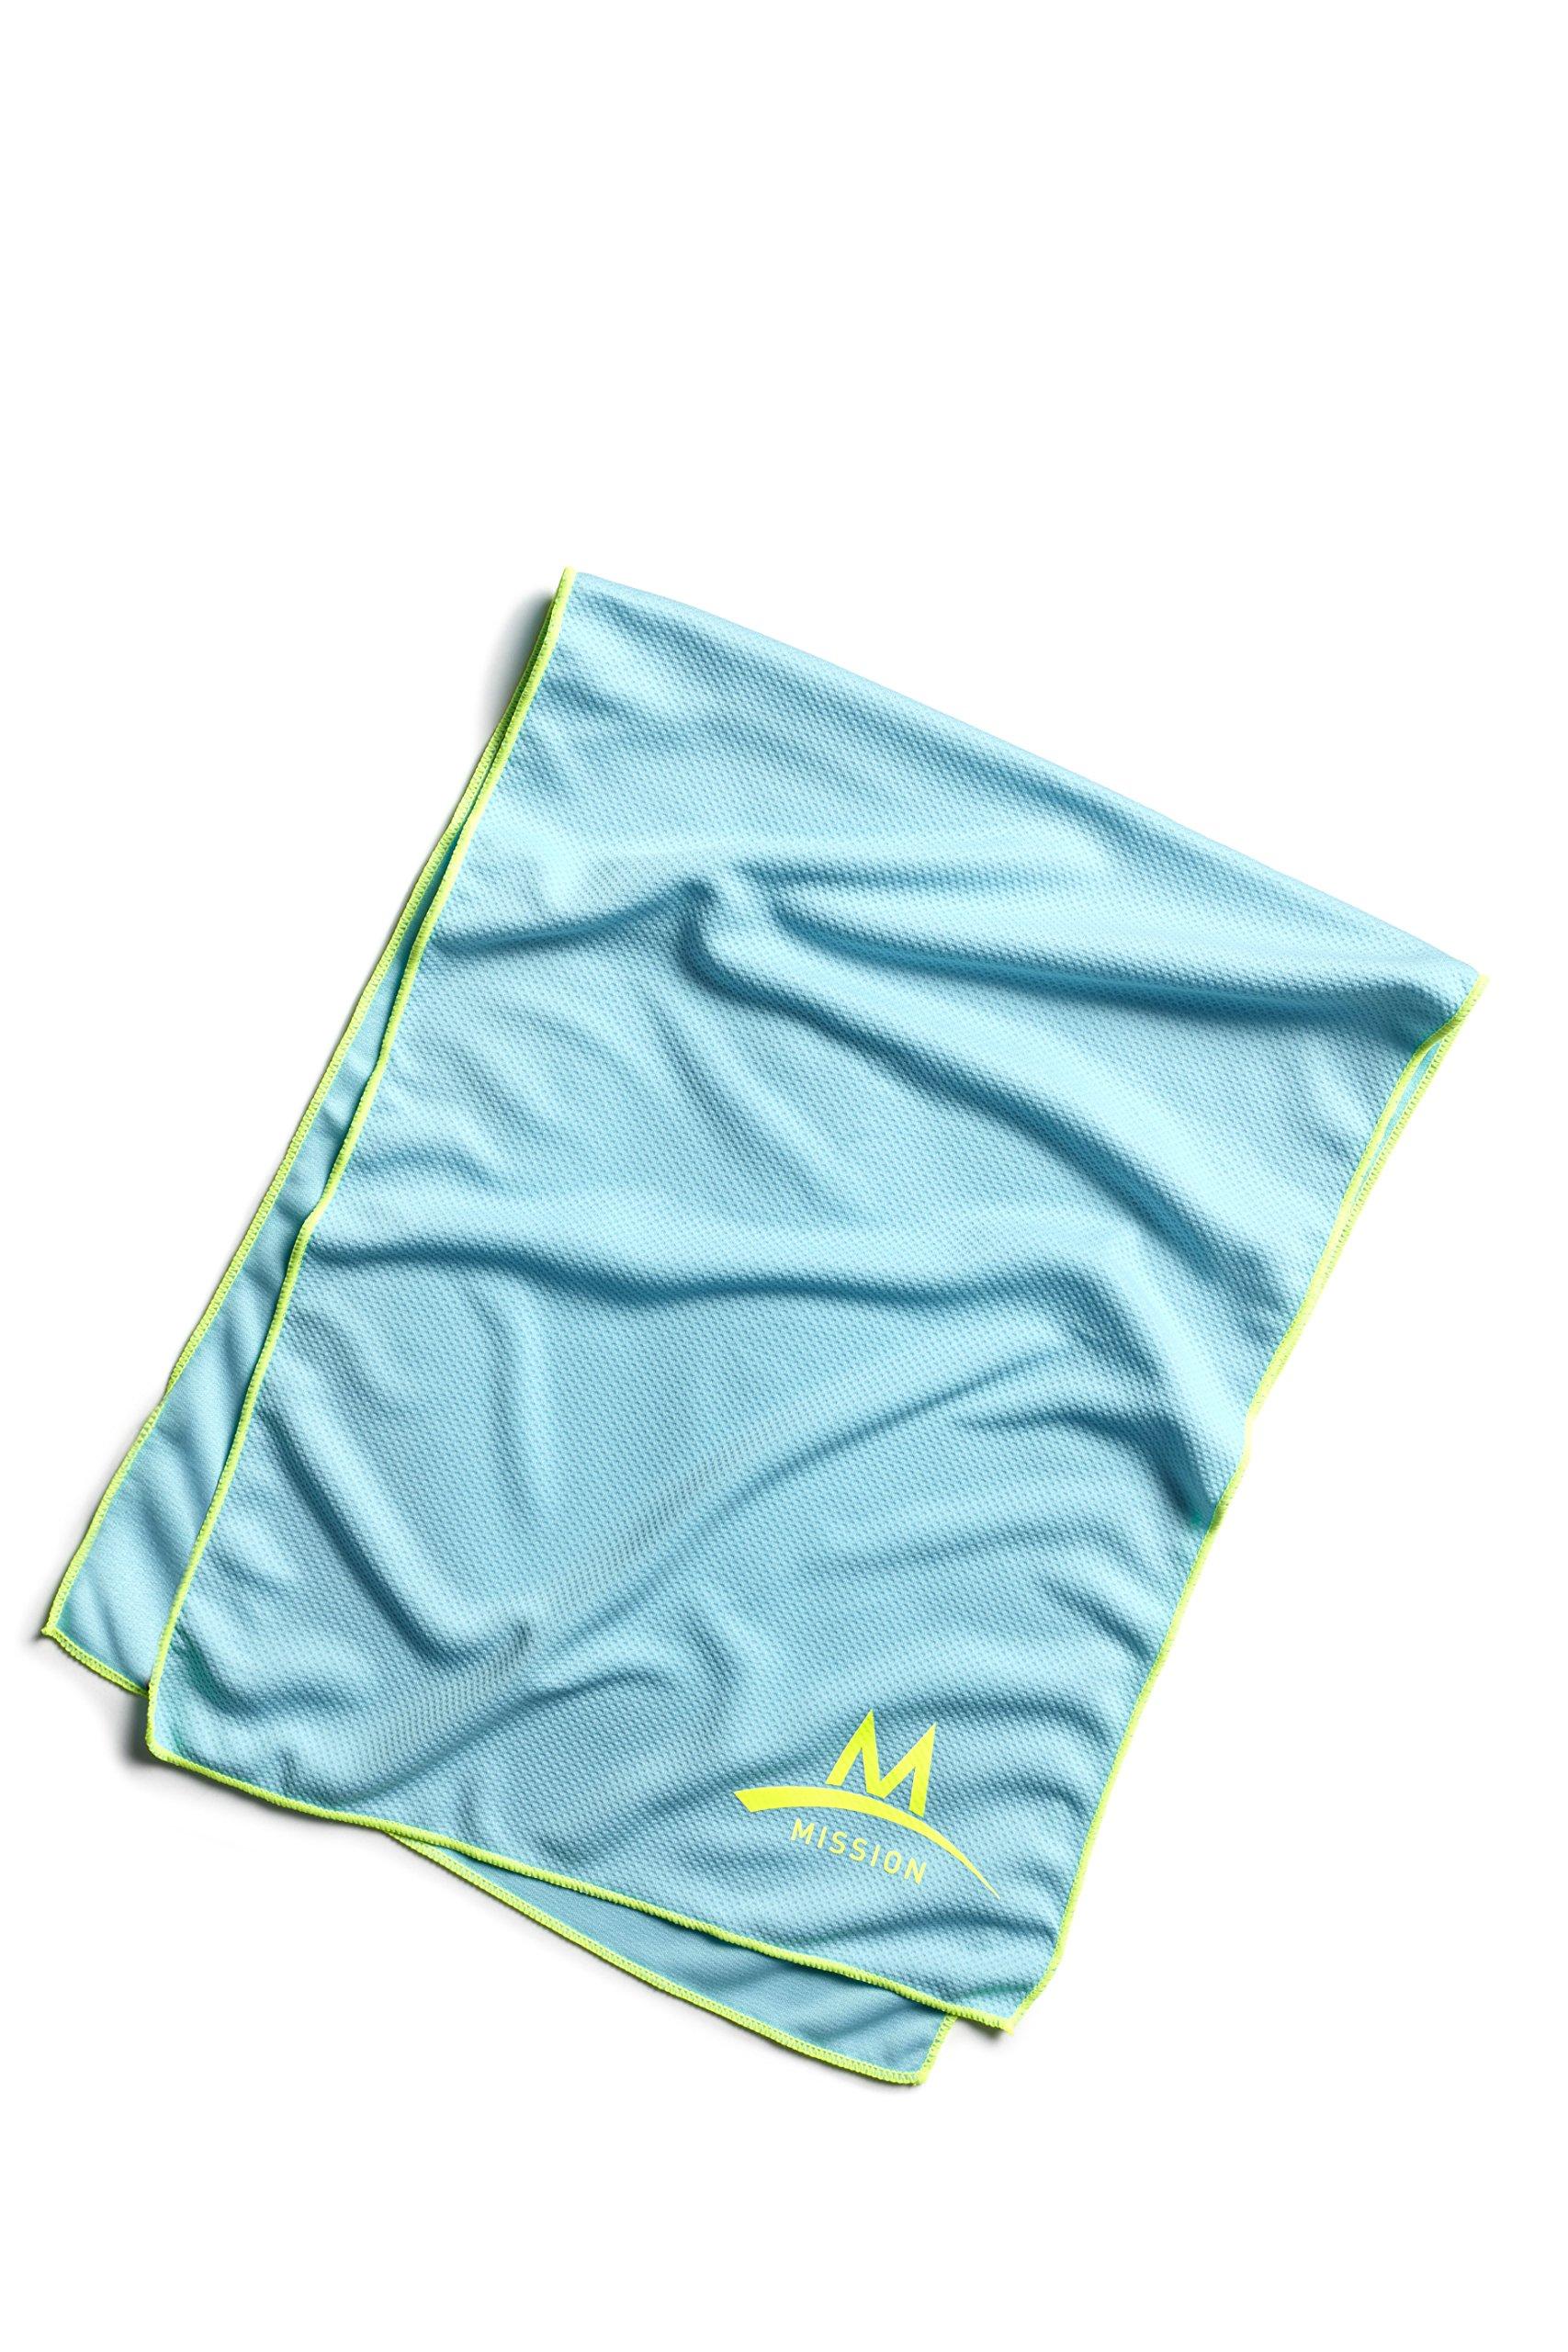 Mission Enduracool Techknit Cooling Towel, Large, Blue Fish